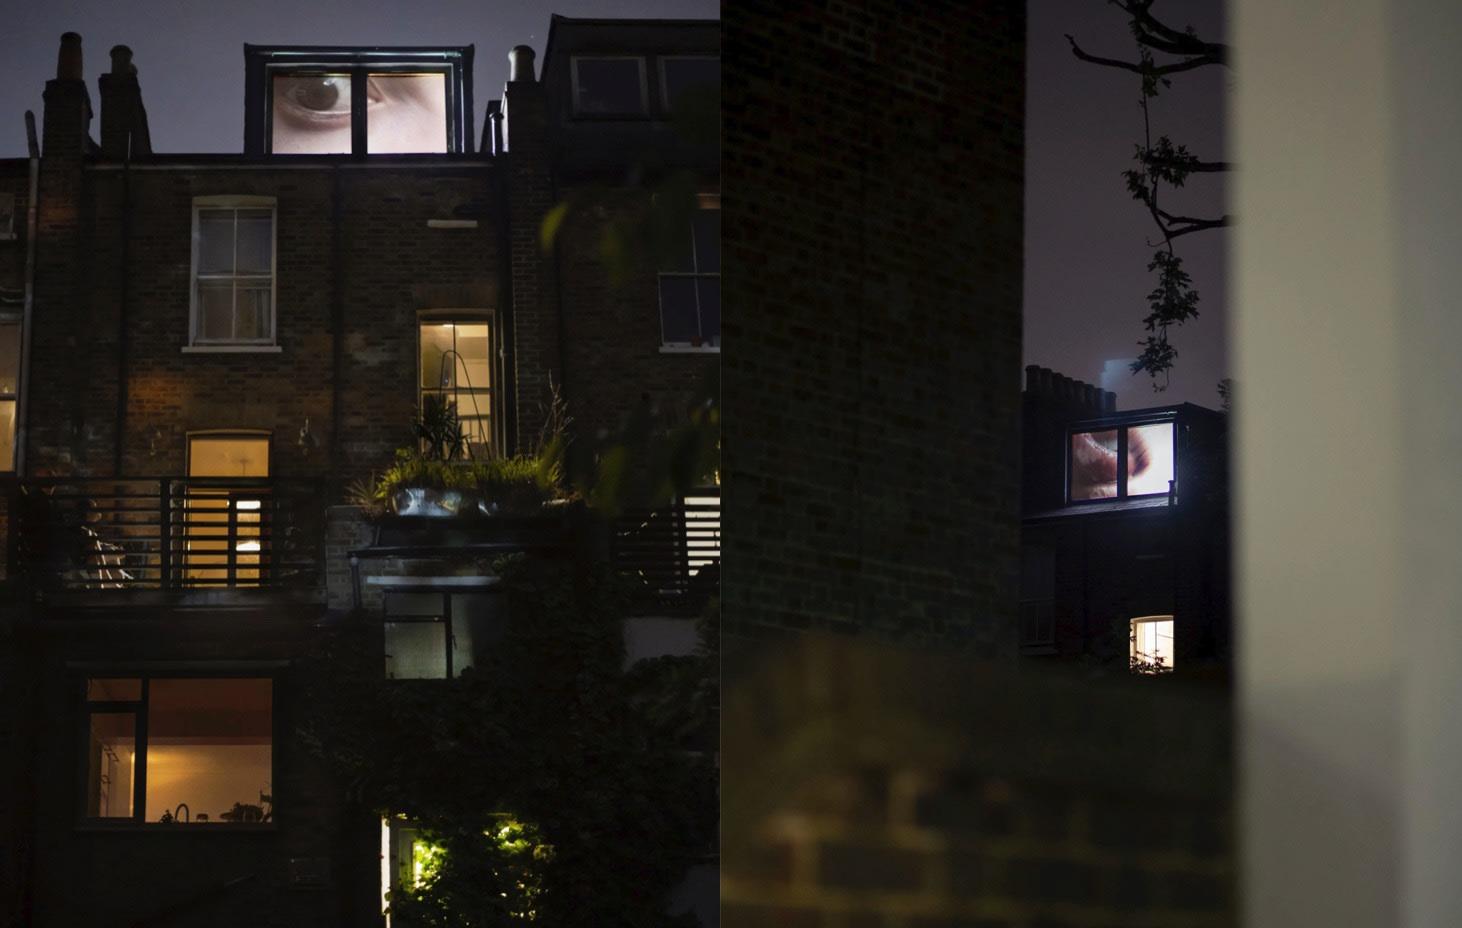 Laura-Giesdorf-Secretion-Window.jpg